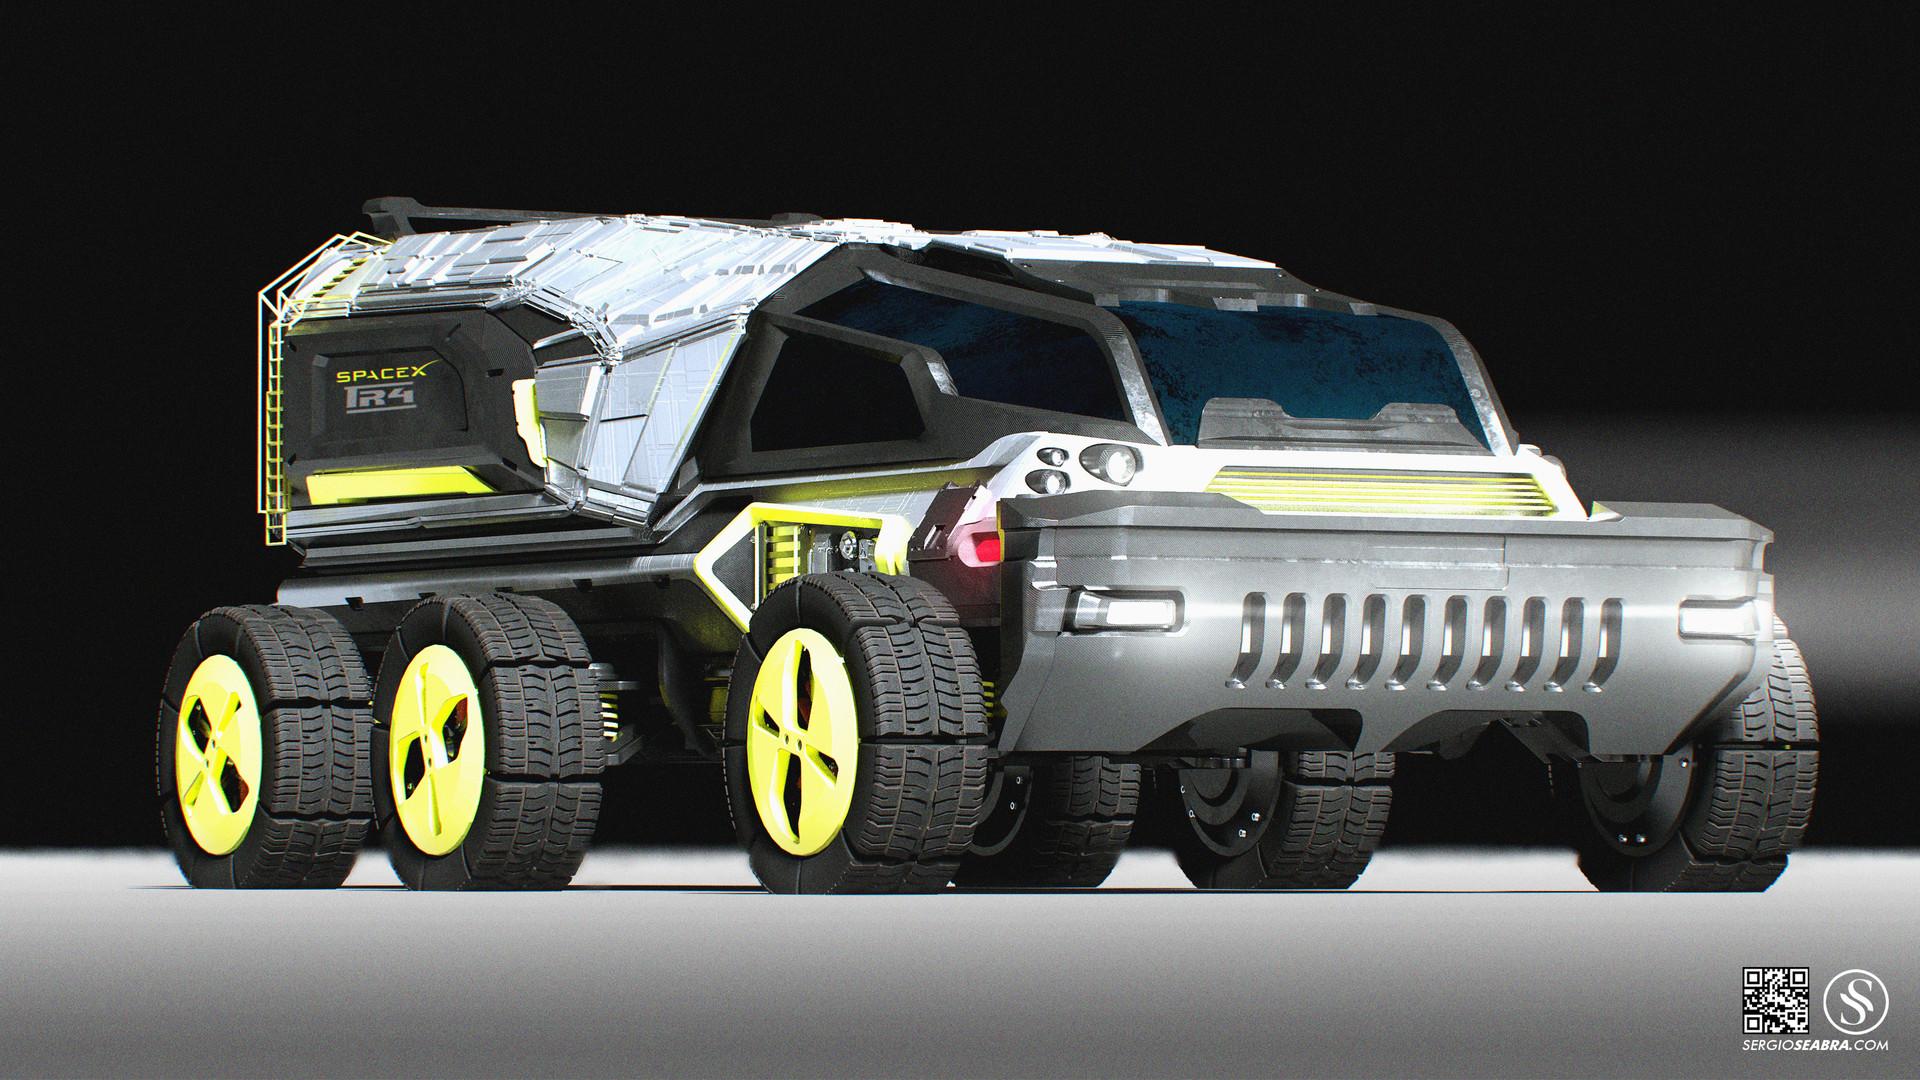 Sergio seabra 201810 veh mars rover layout3 ss